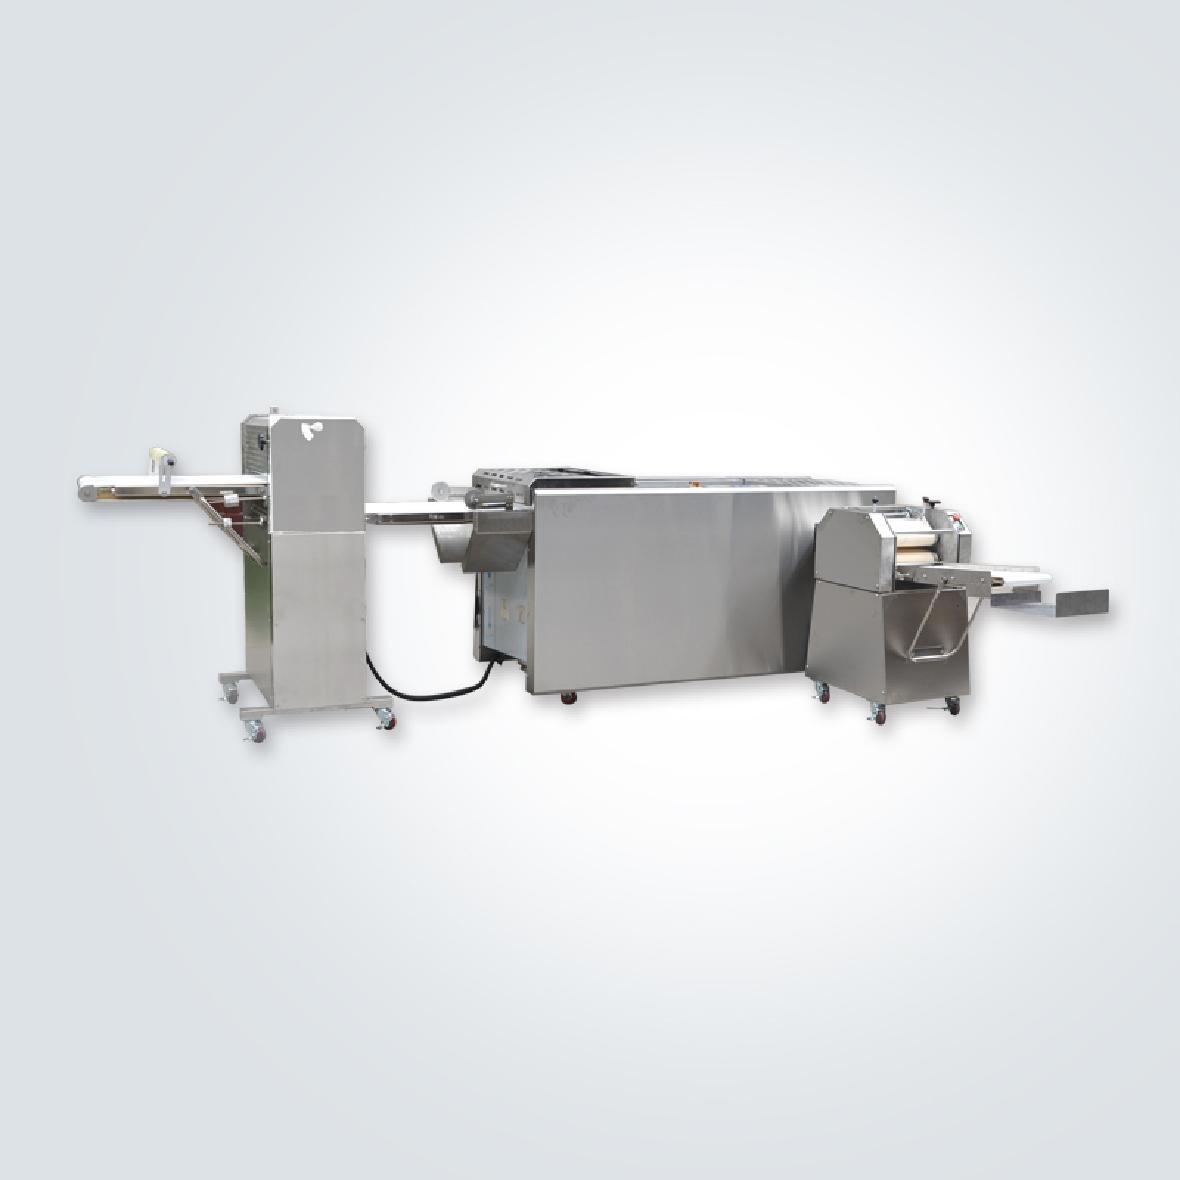 SM-4000 羊角生產線